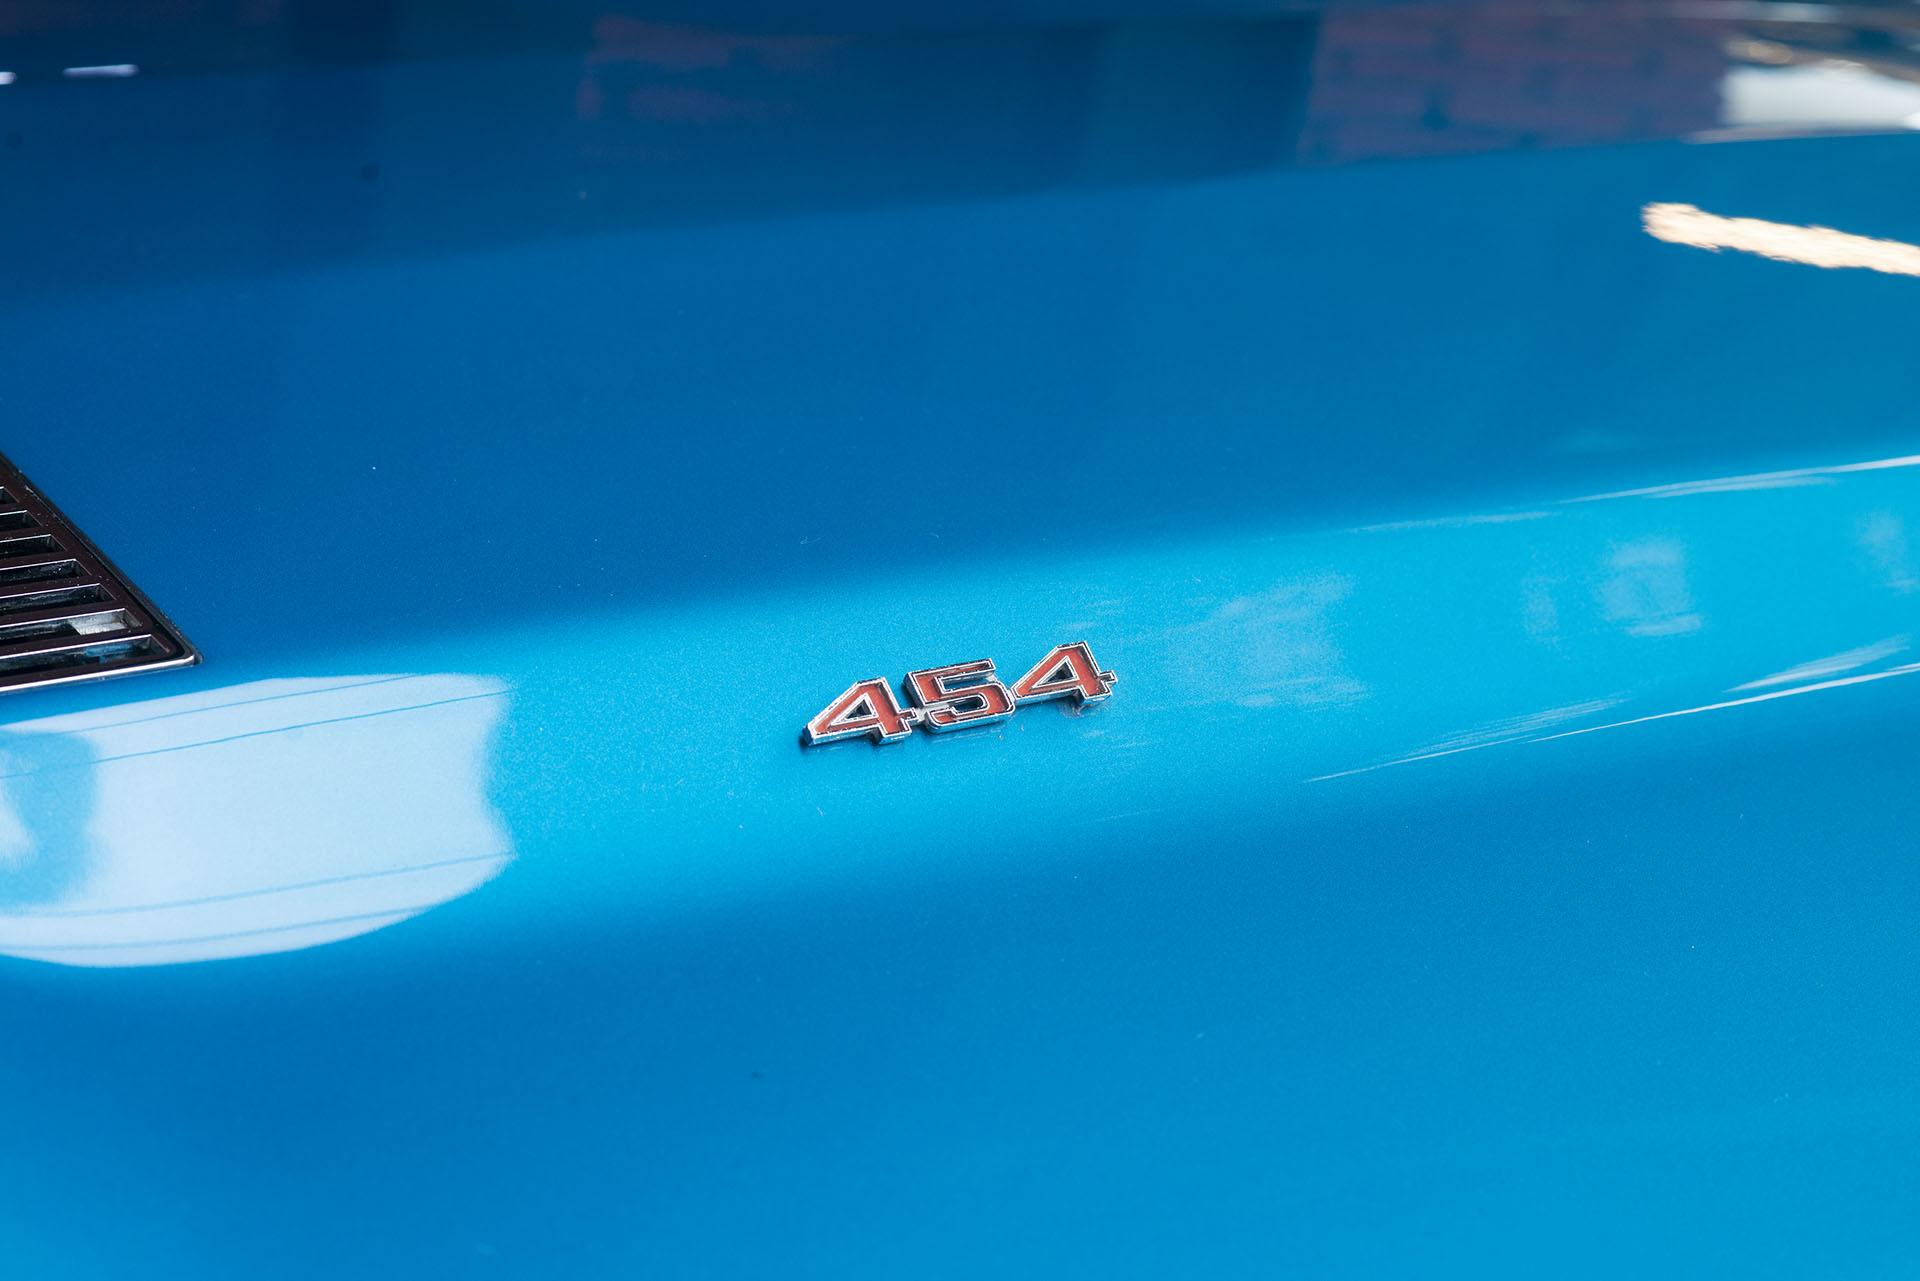 Corvette Stingray For Sale >> corvette stingray blue targa (5) - Richmonds - Classic and Prestige Cars - Storage and Sales ...